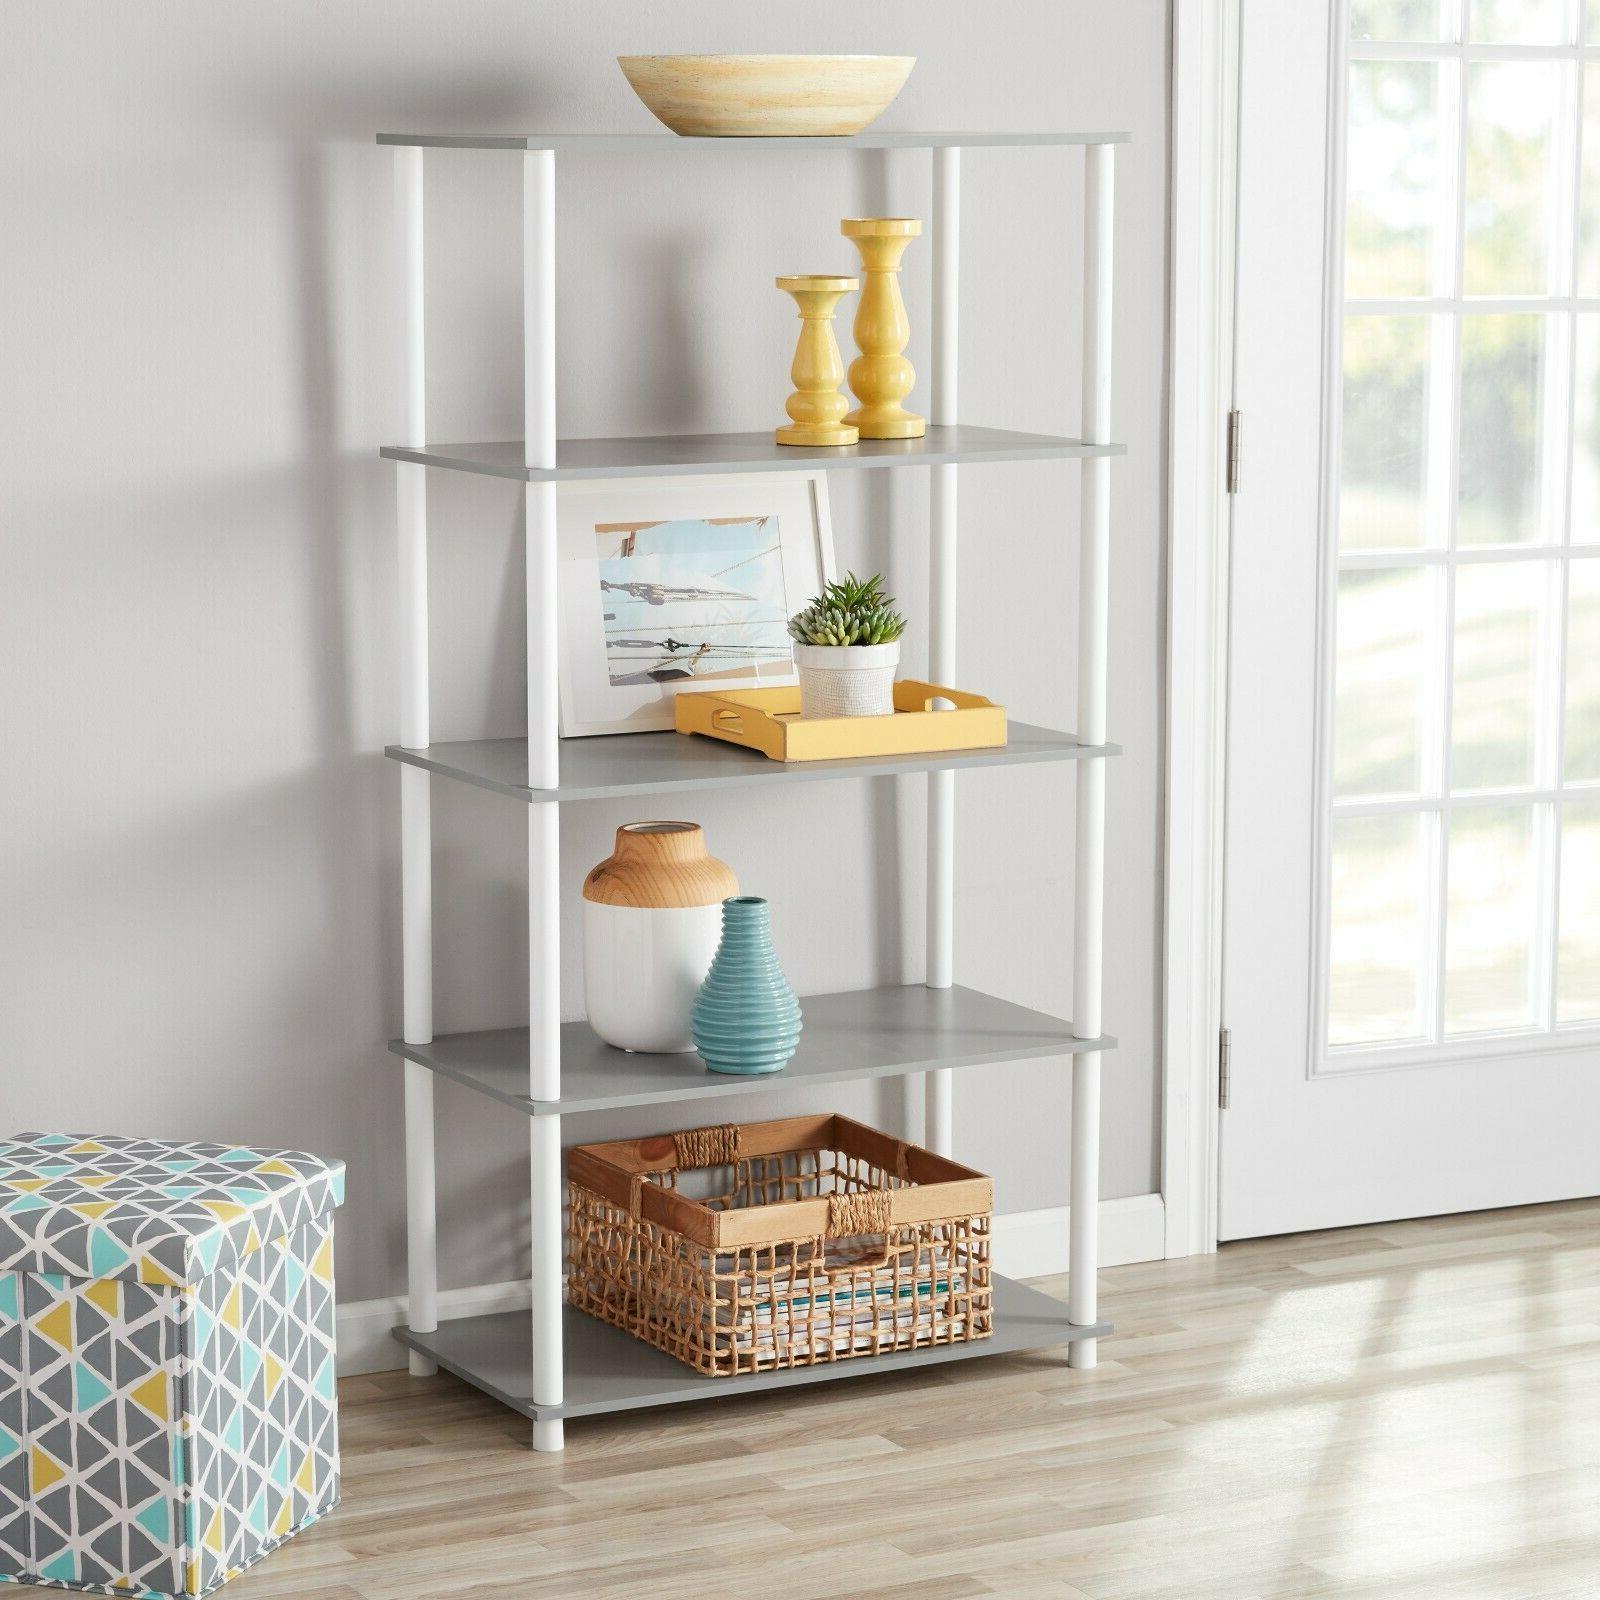 Open Simple Standard Storage Bookshelf No